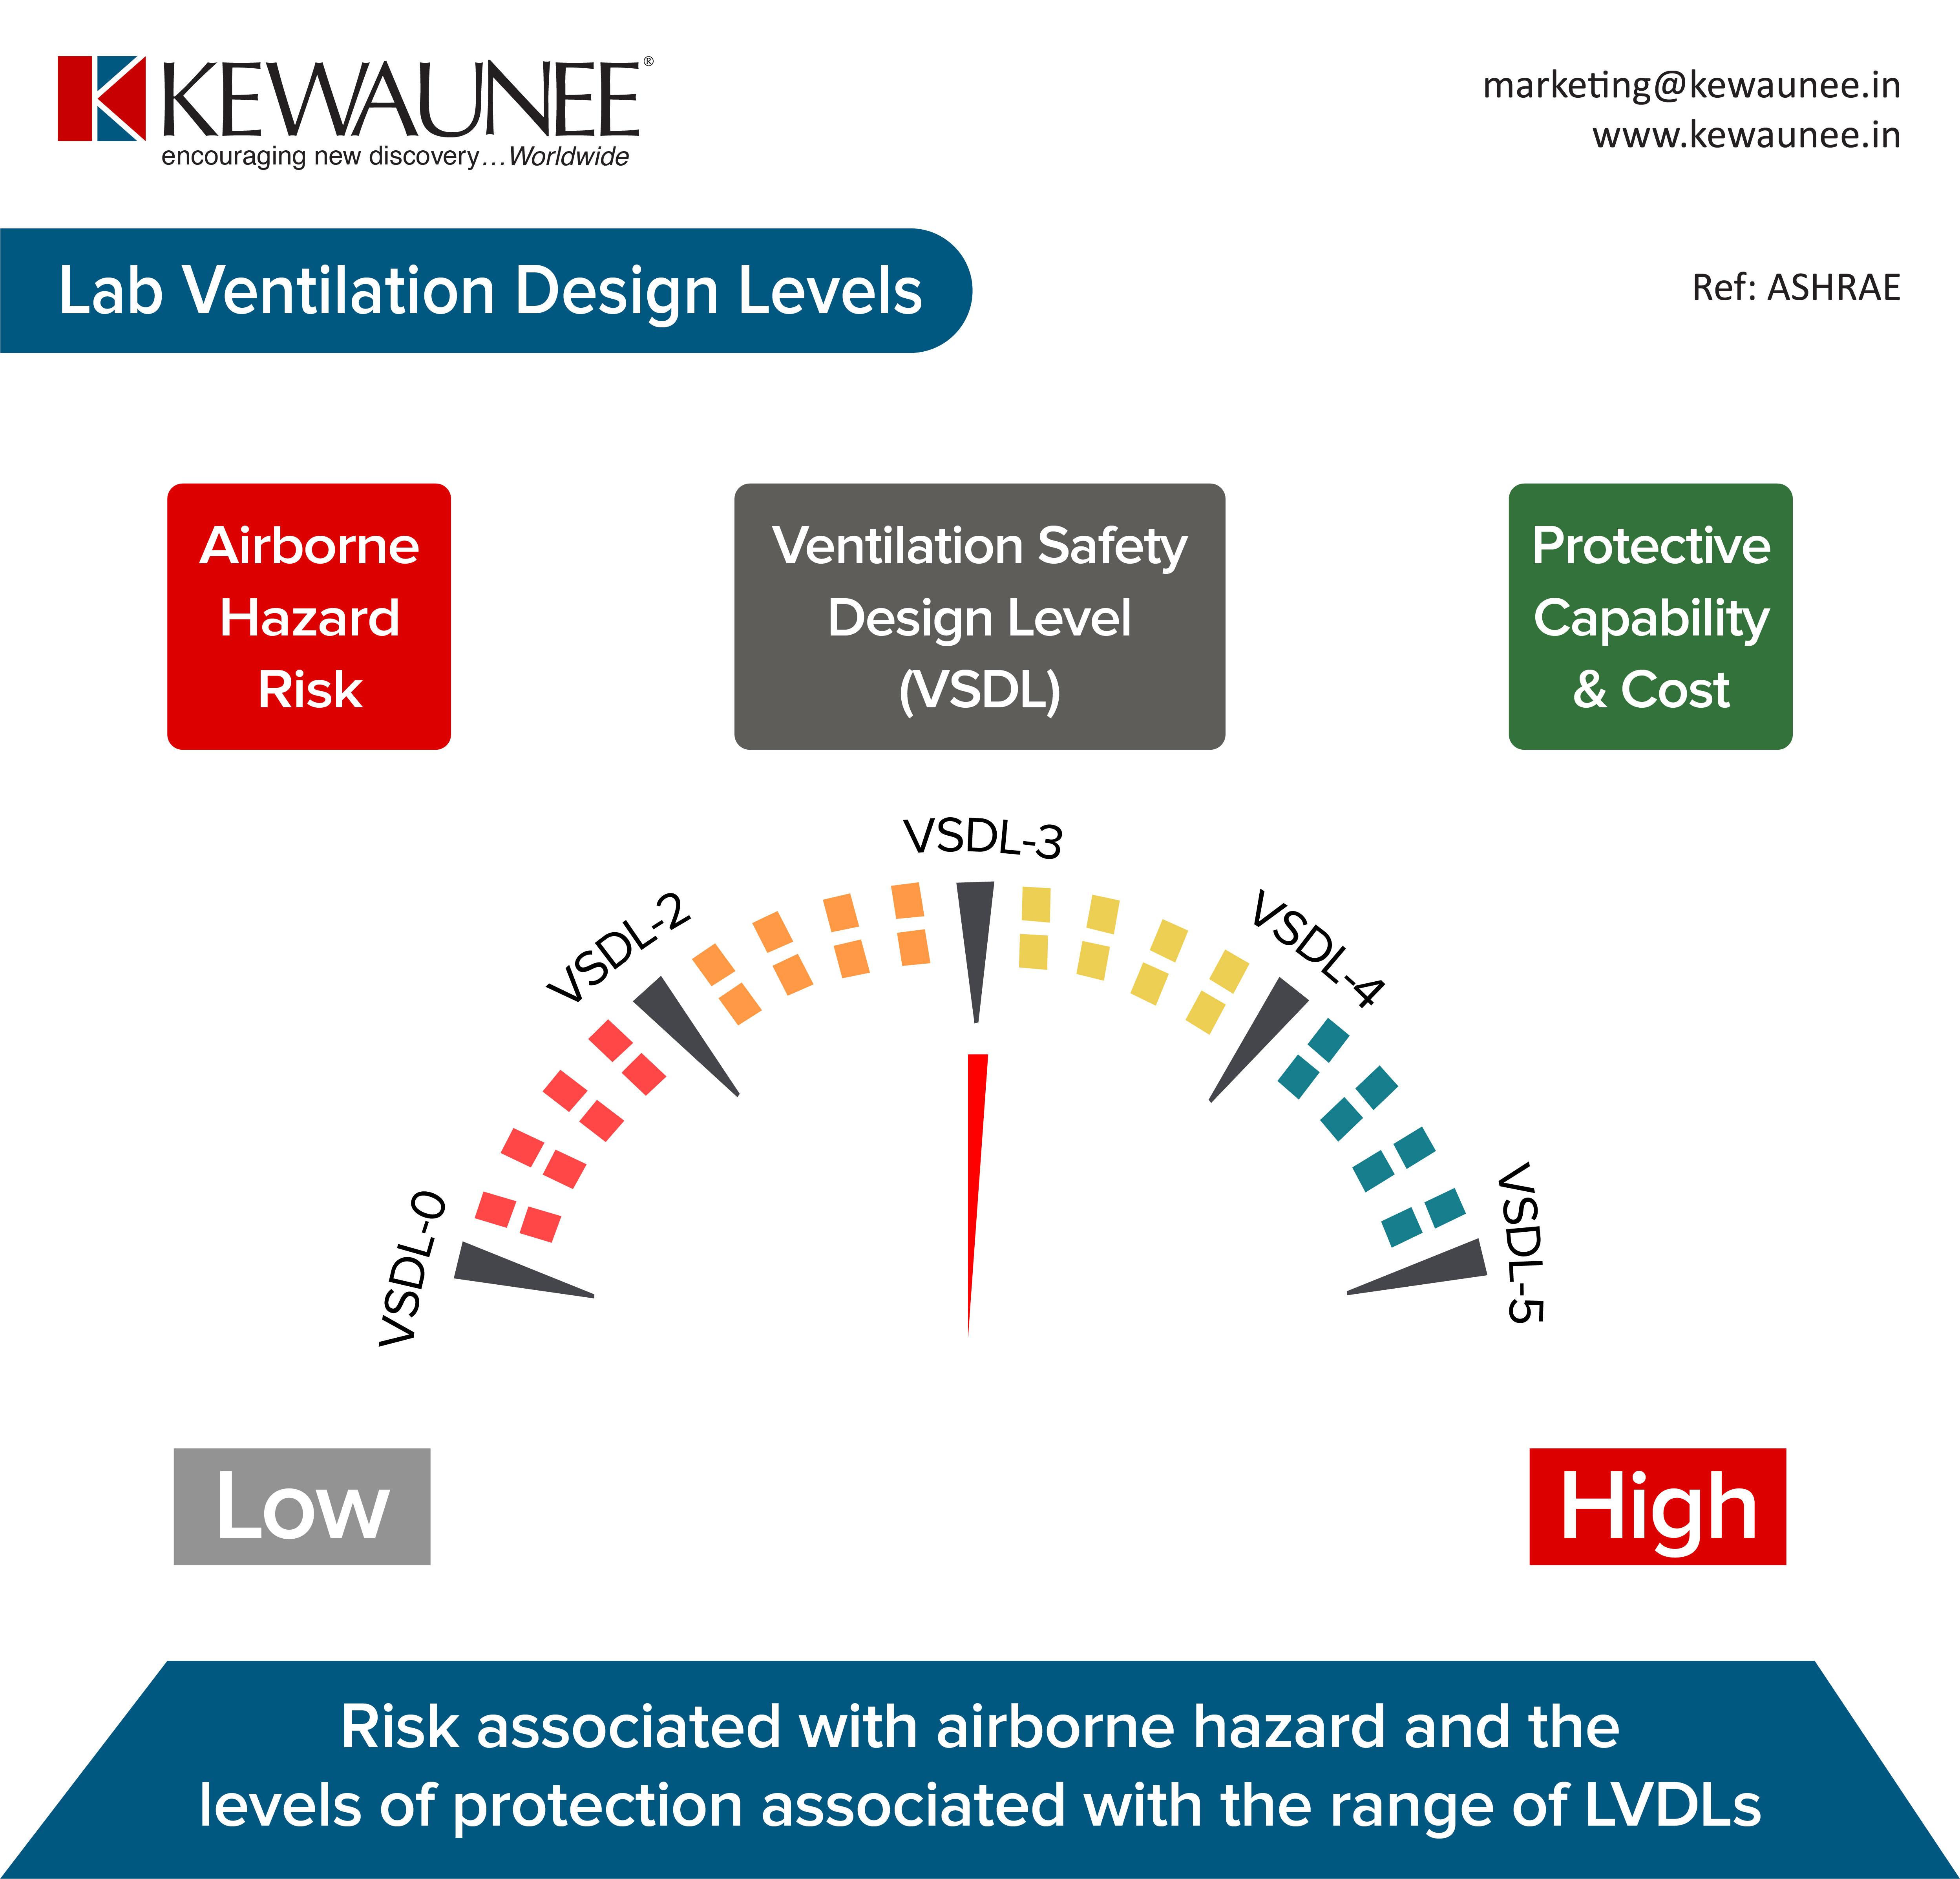 Lab Ventilation Design Levels